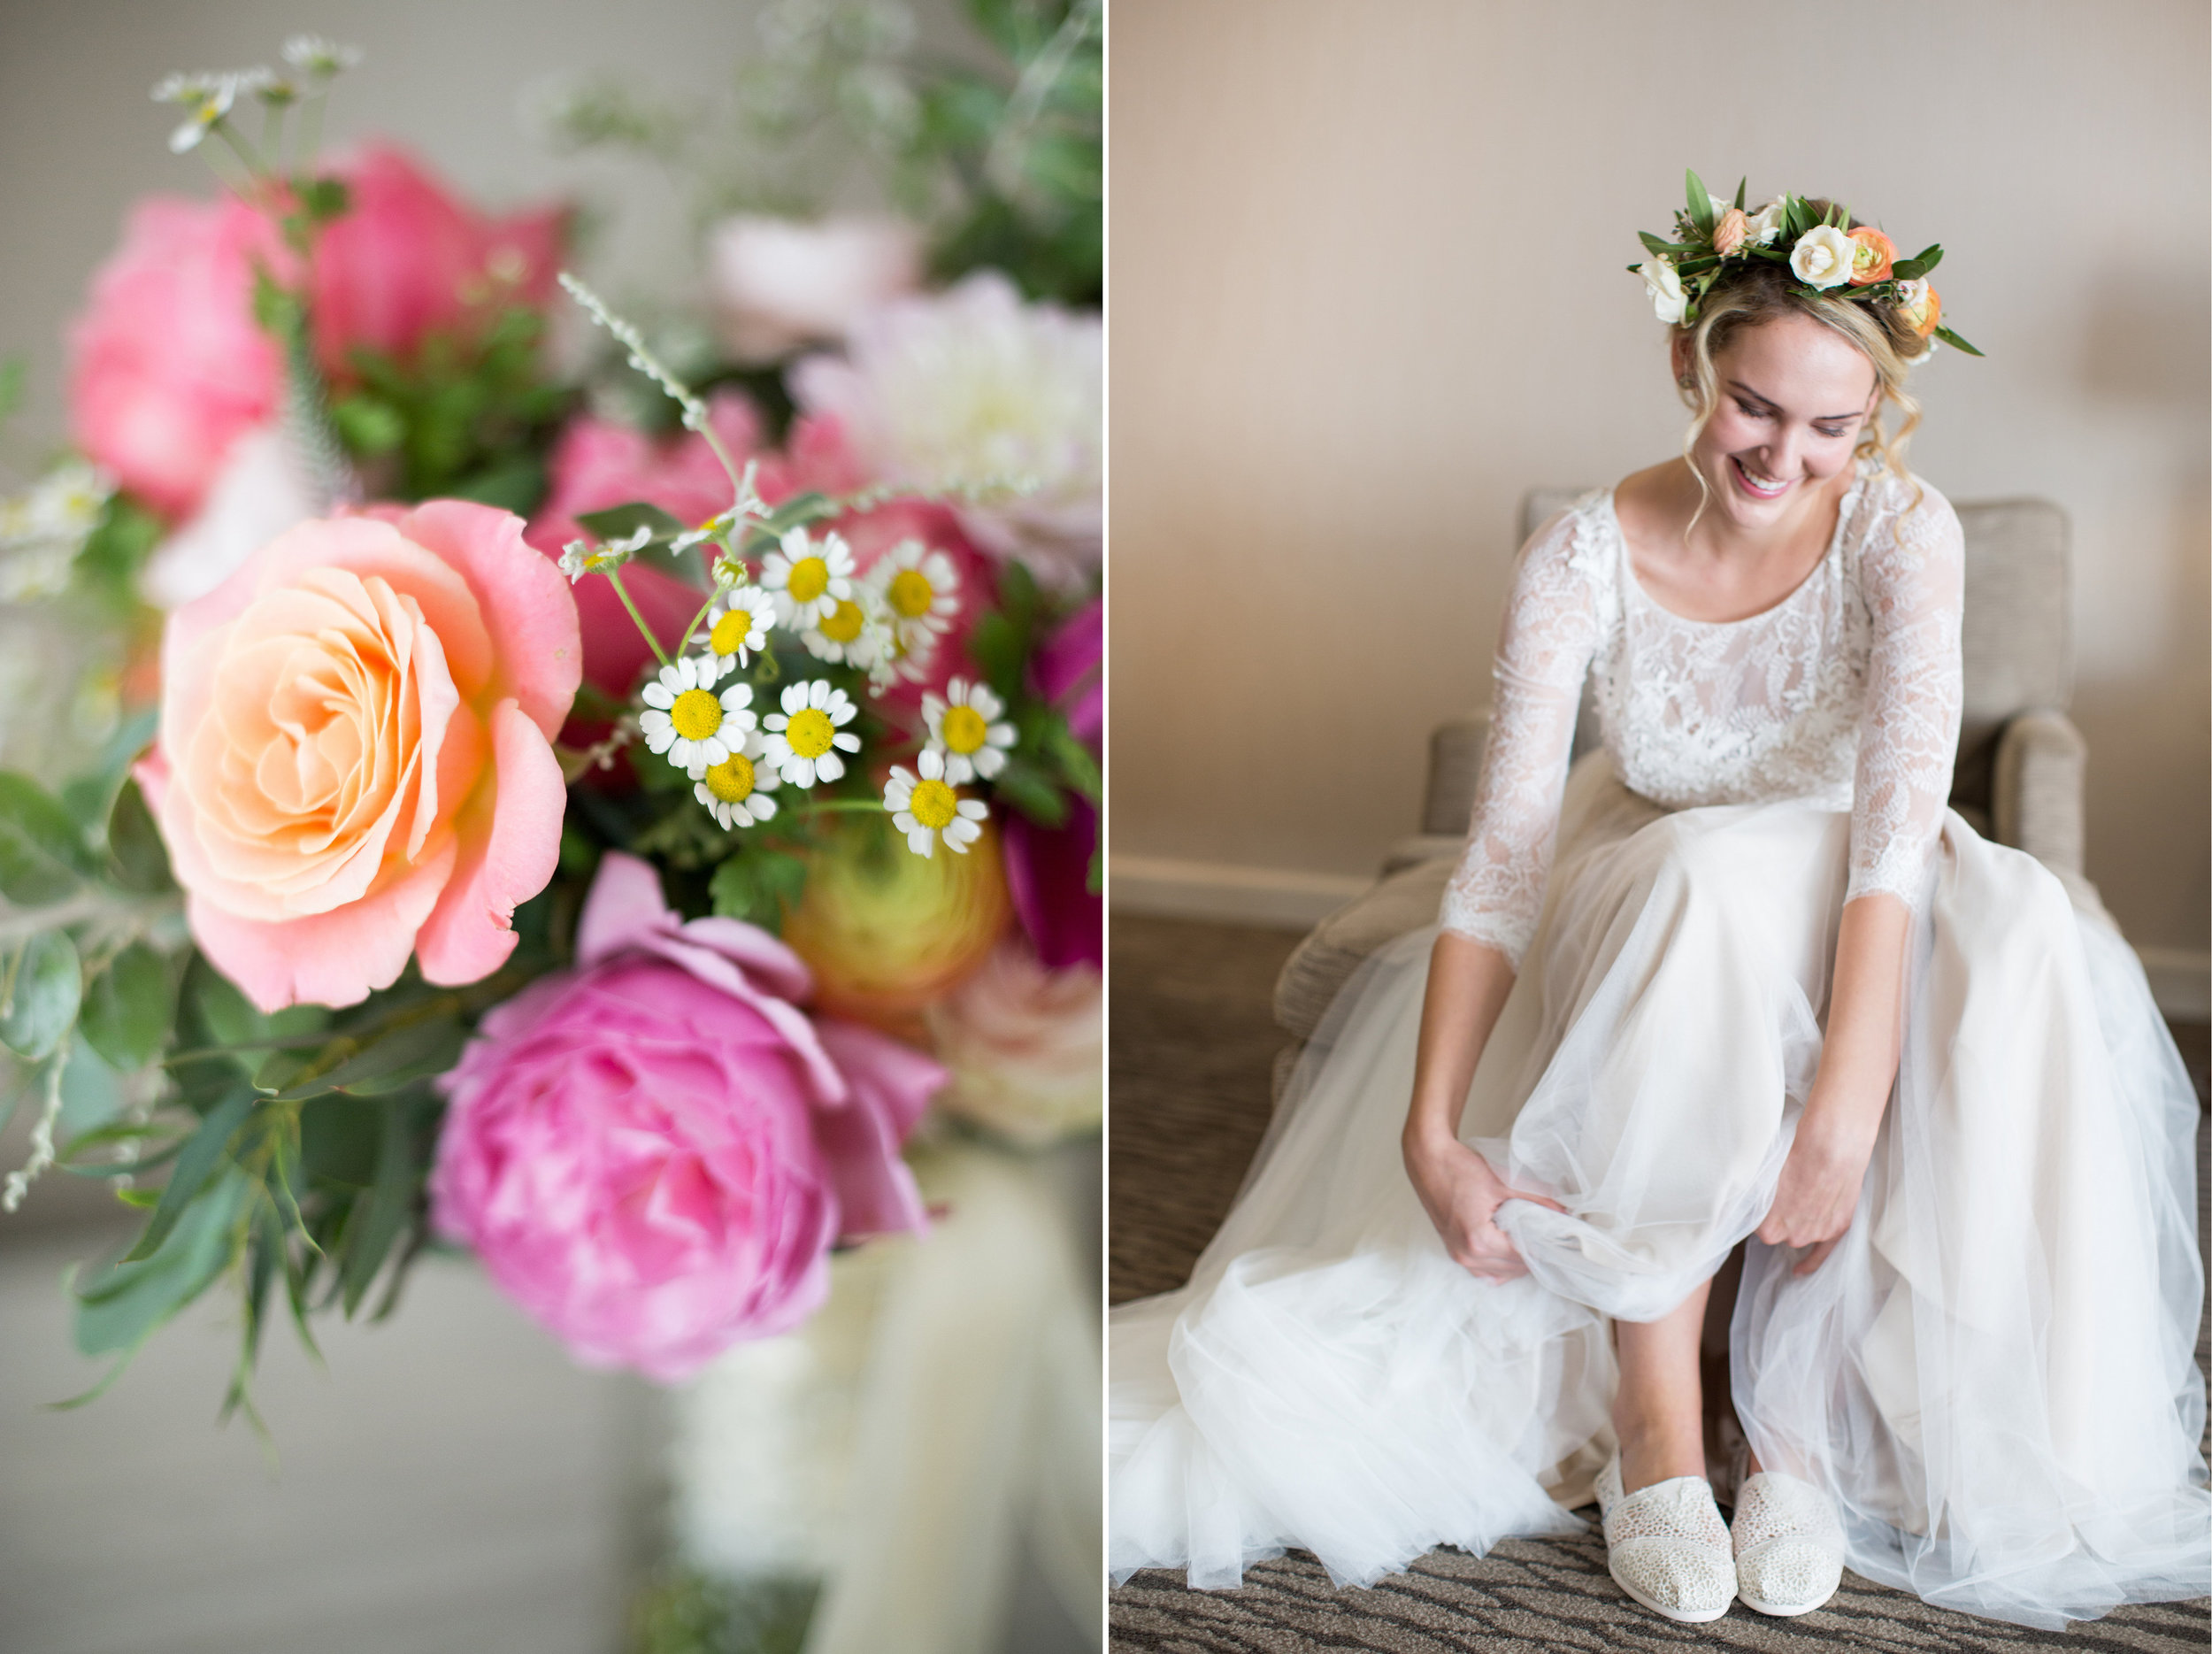 www.santabarbarawedding.com | Anna J Photography | Santa Barbara Courthouse | Ella & Louie | Bride | Bridal Bouquet